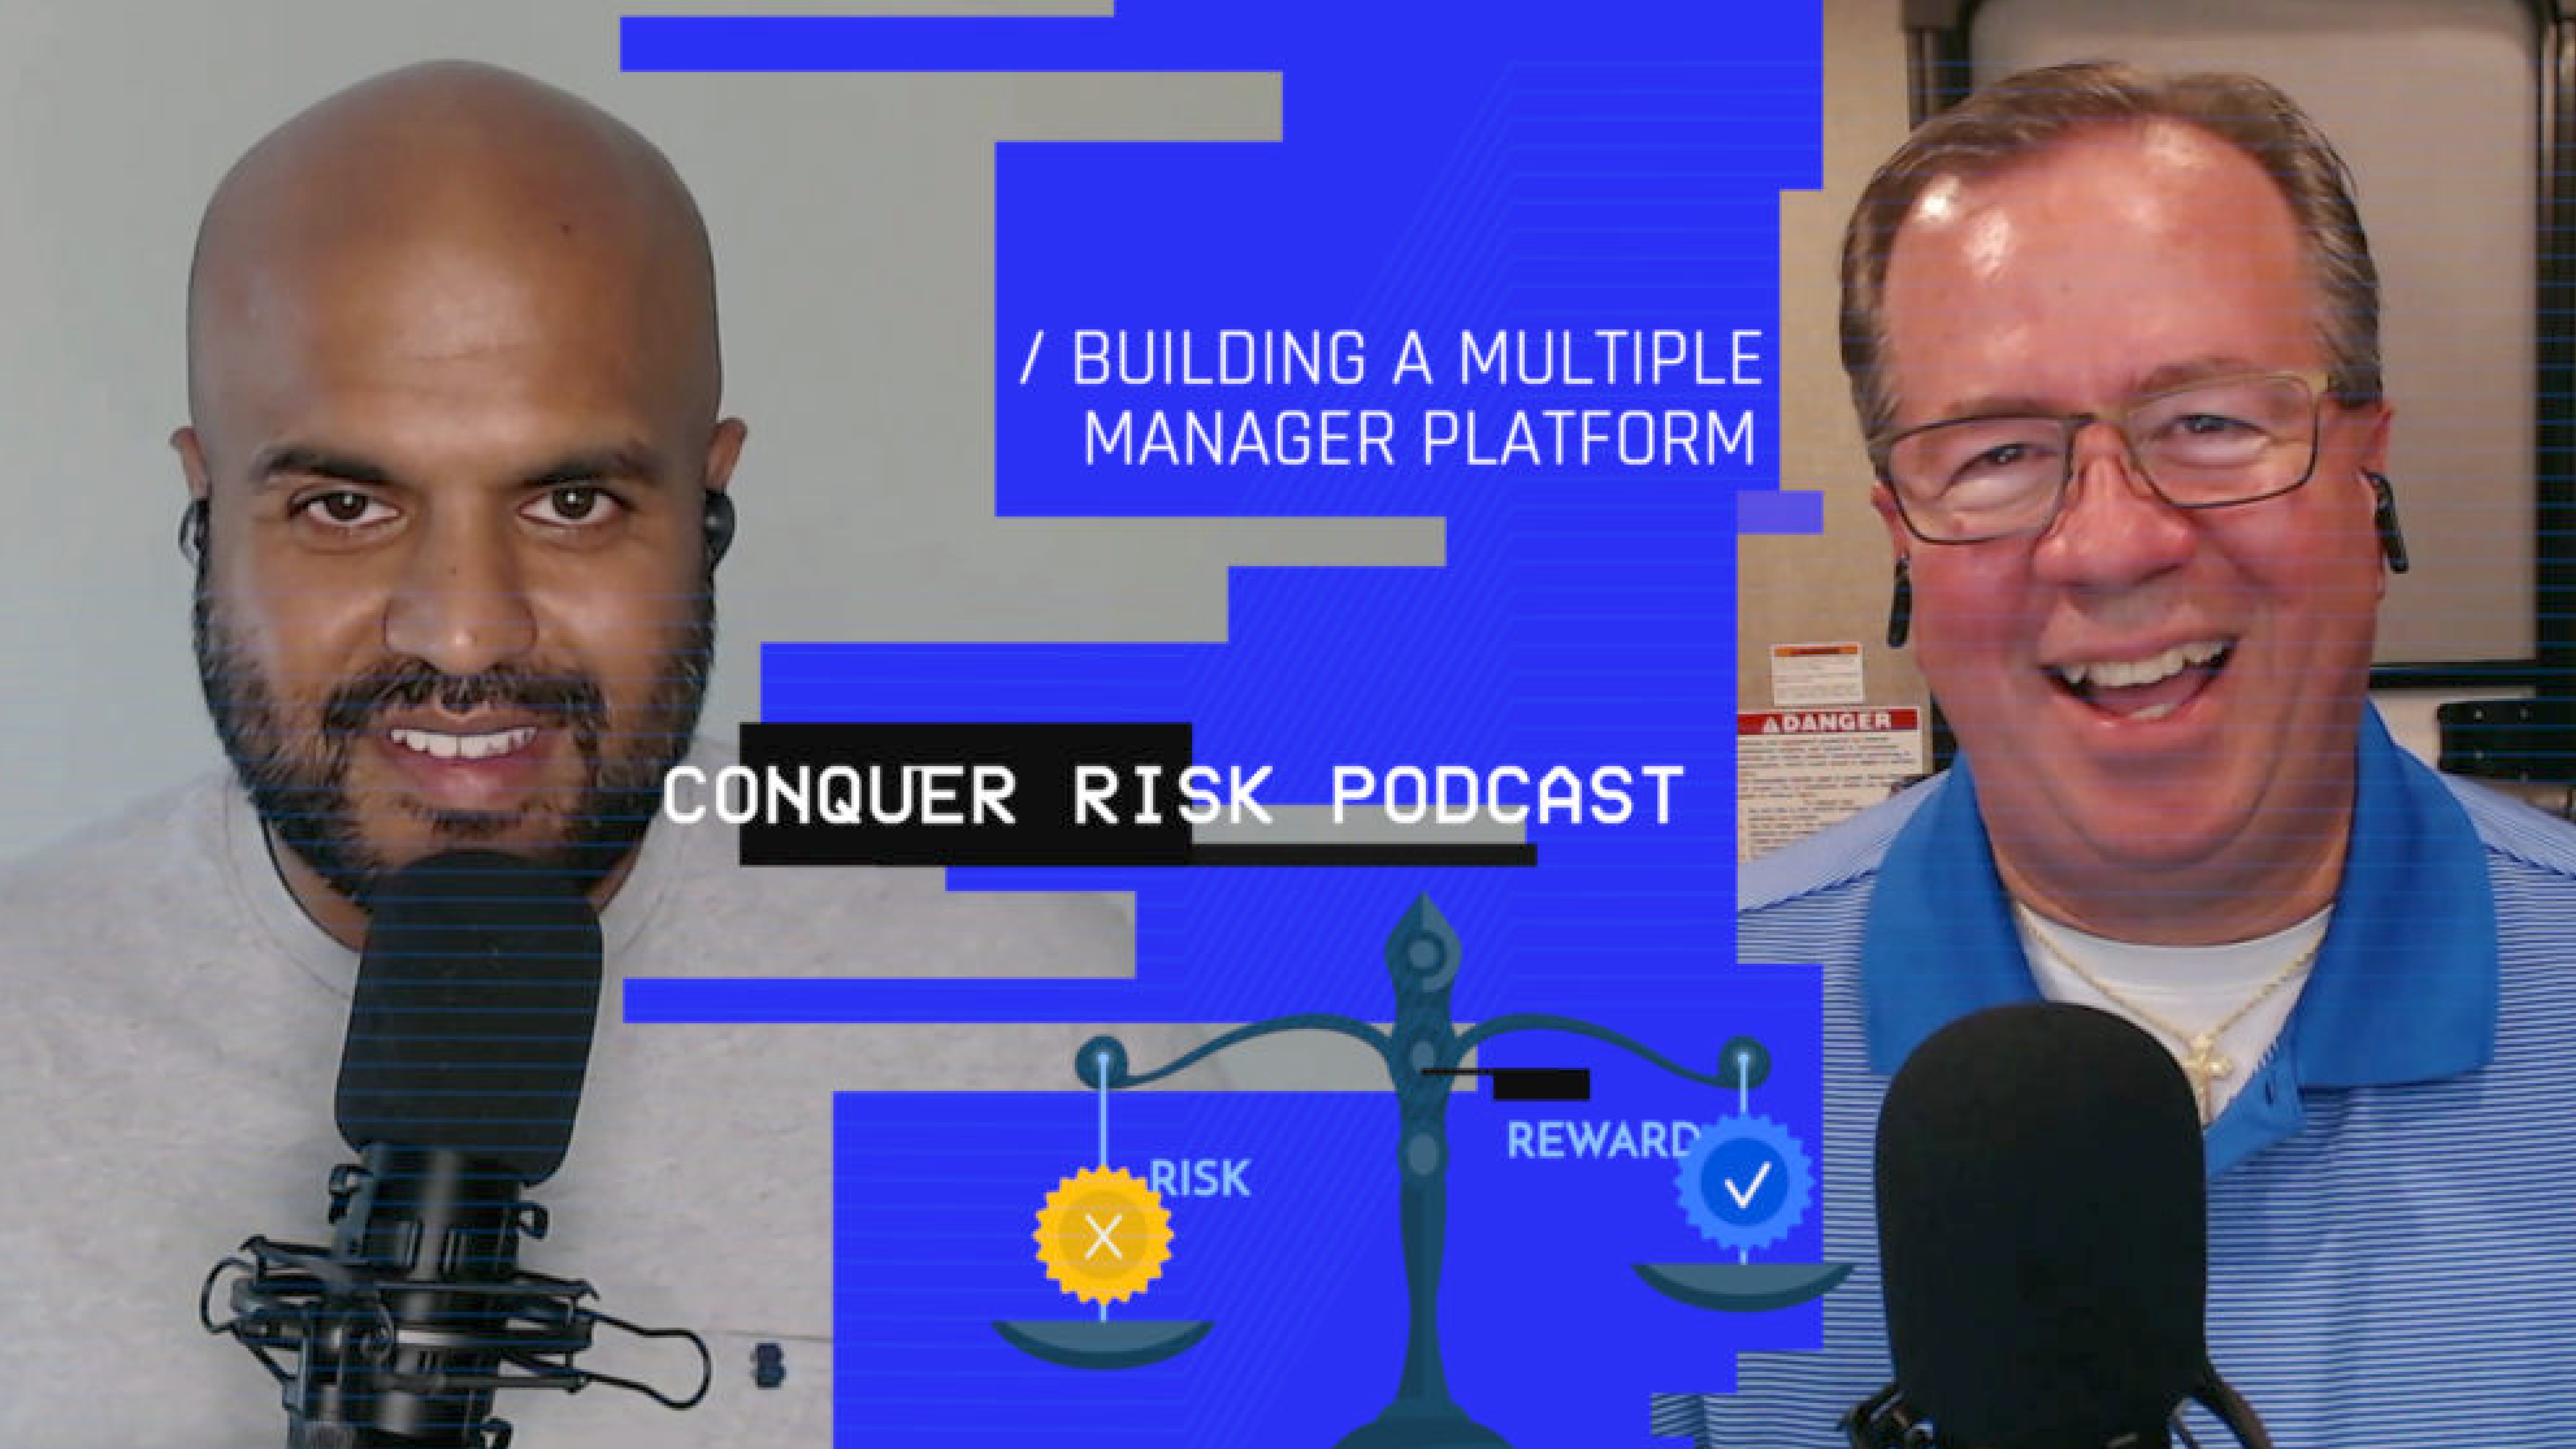 Building a Multiple Manager Platform (S2 E15)